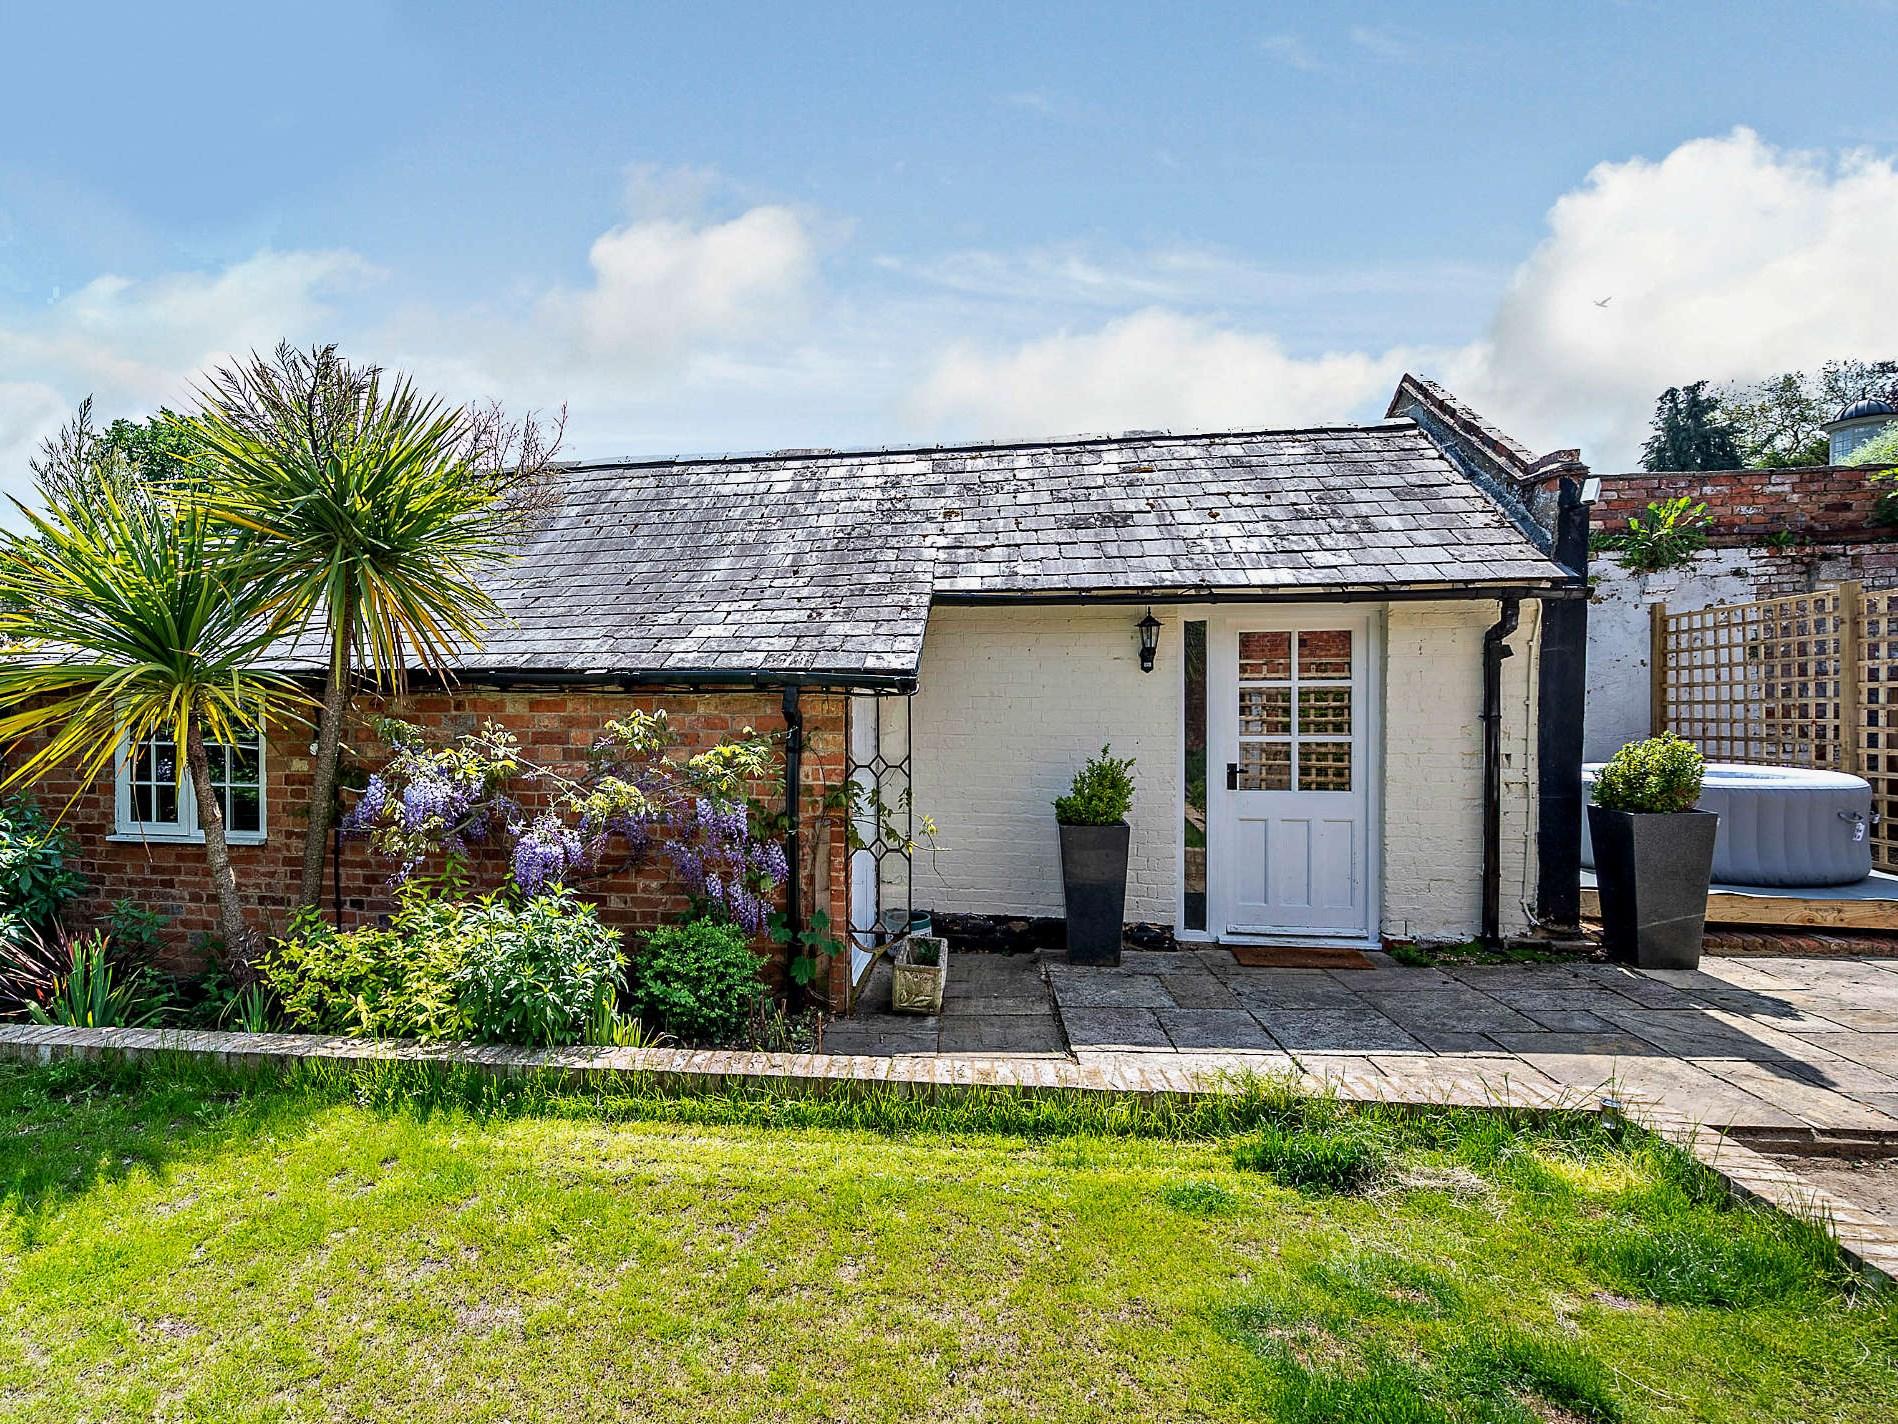 1 Bedroom Cottage in Northampton, Heart of England